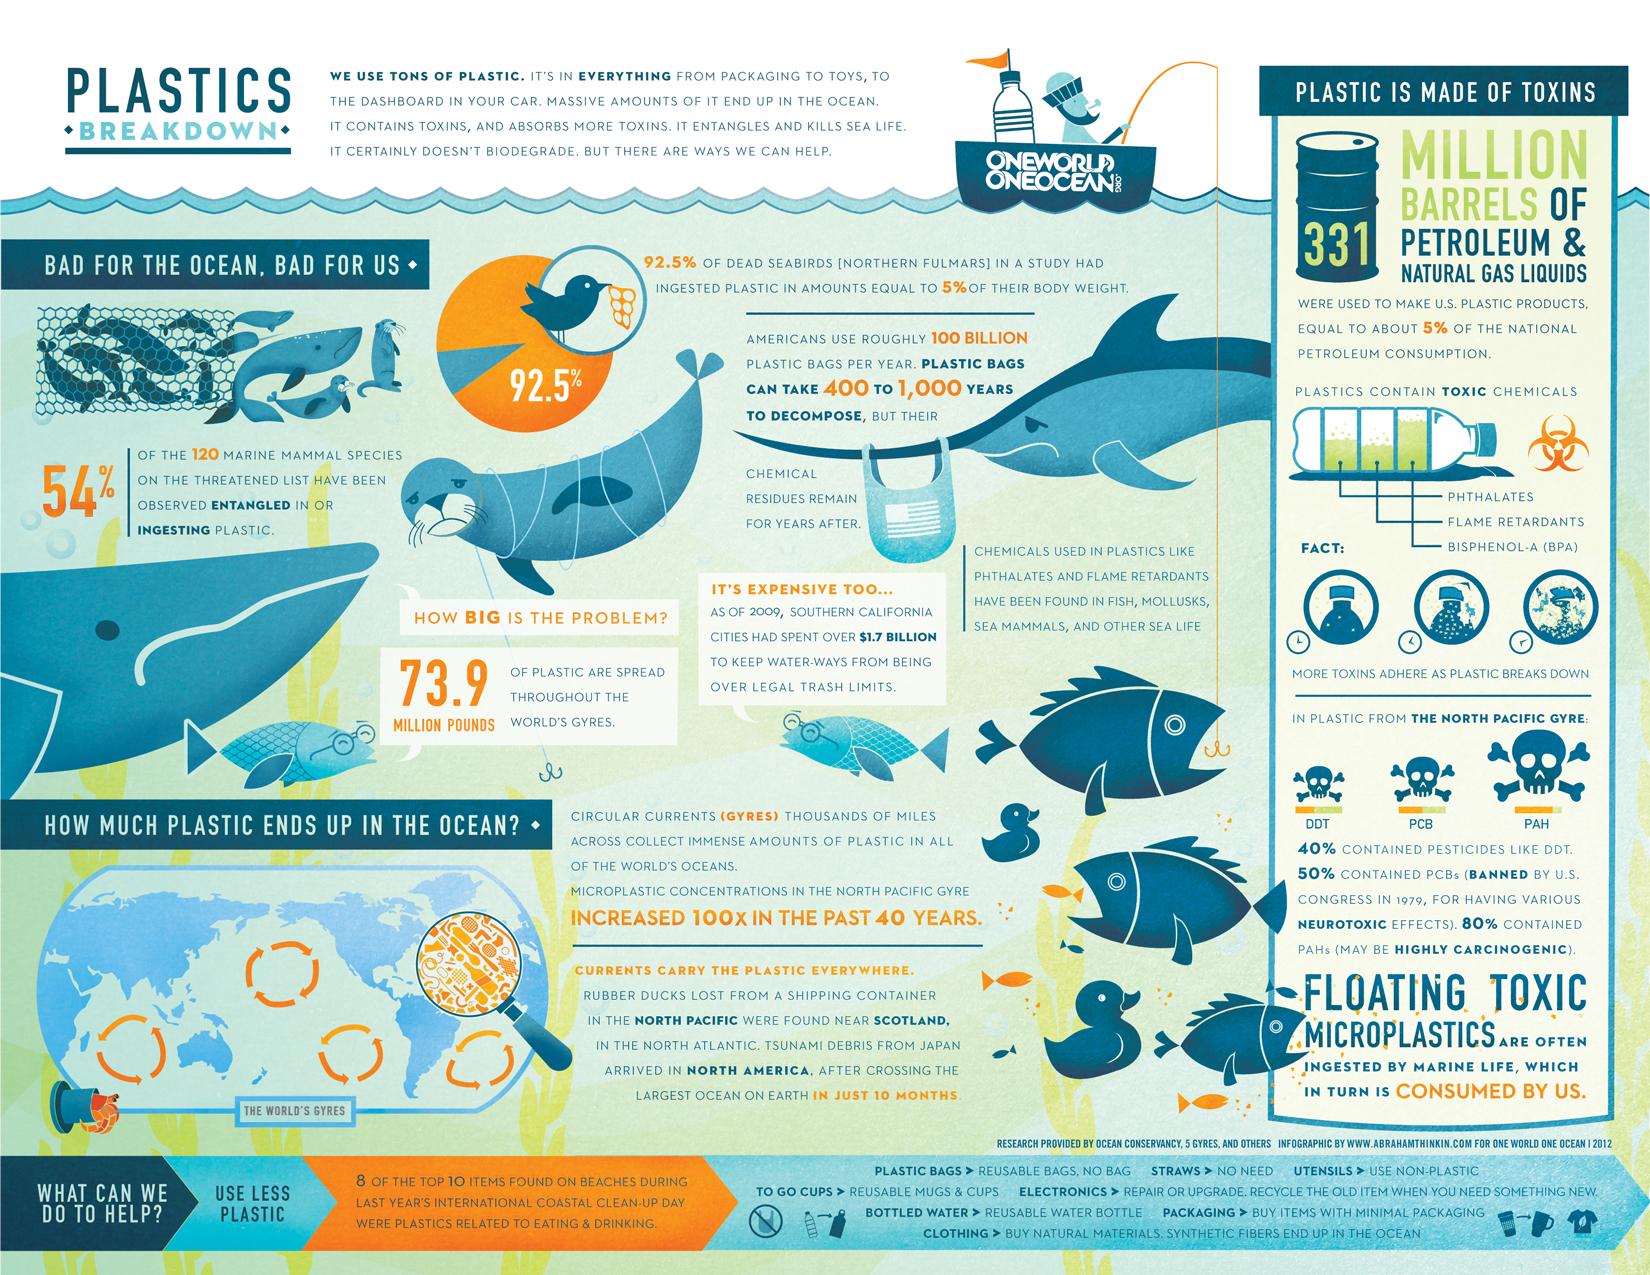 The Plastics Breakdown: An Infographic | One World One Ocean